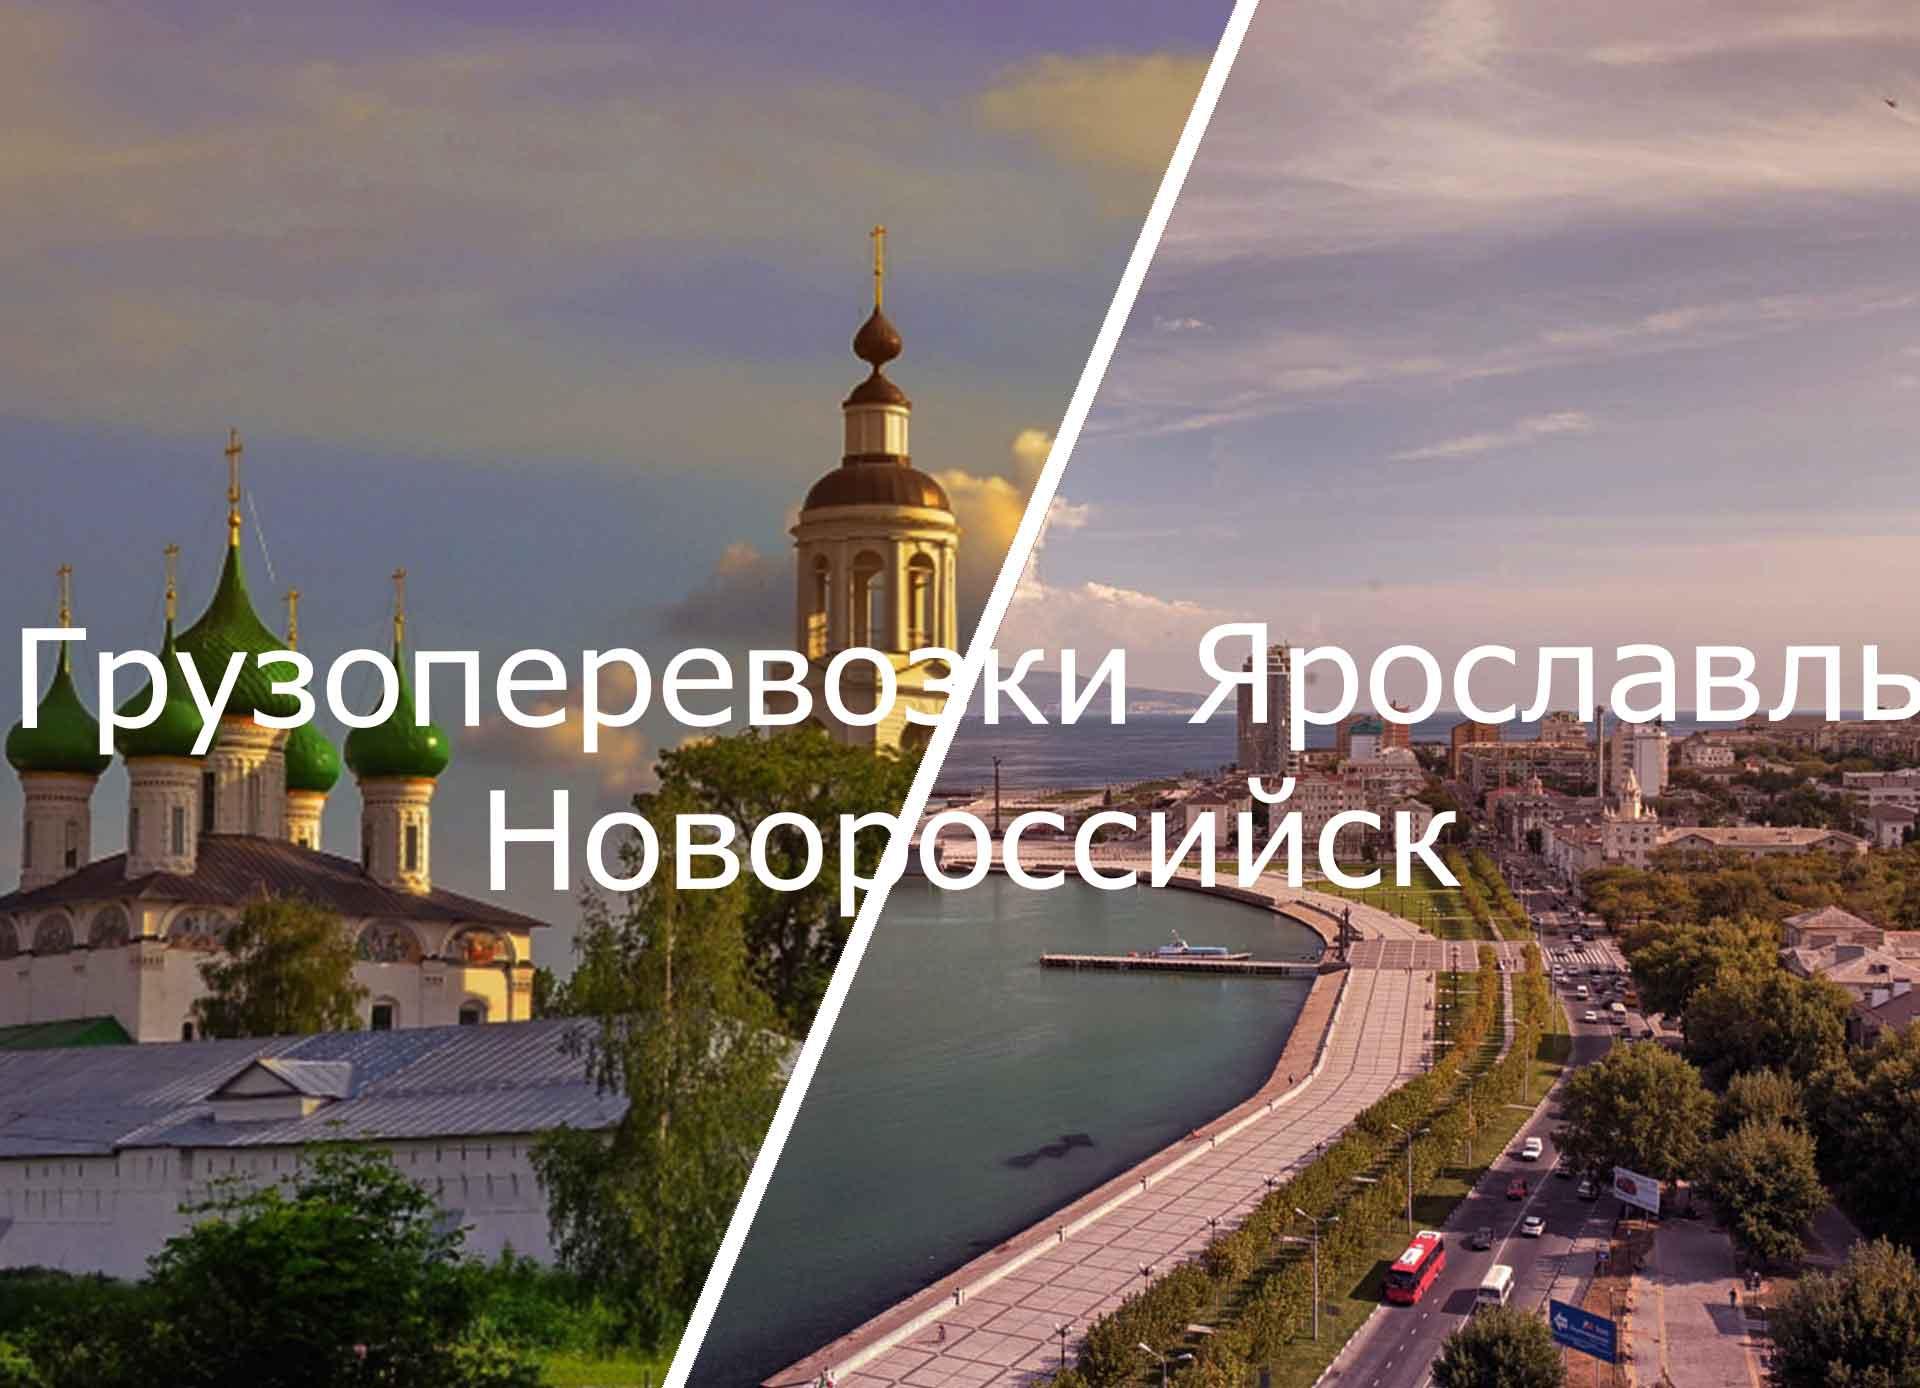 грузоперевозки ярославль новороссийск